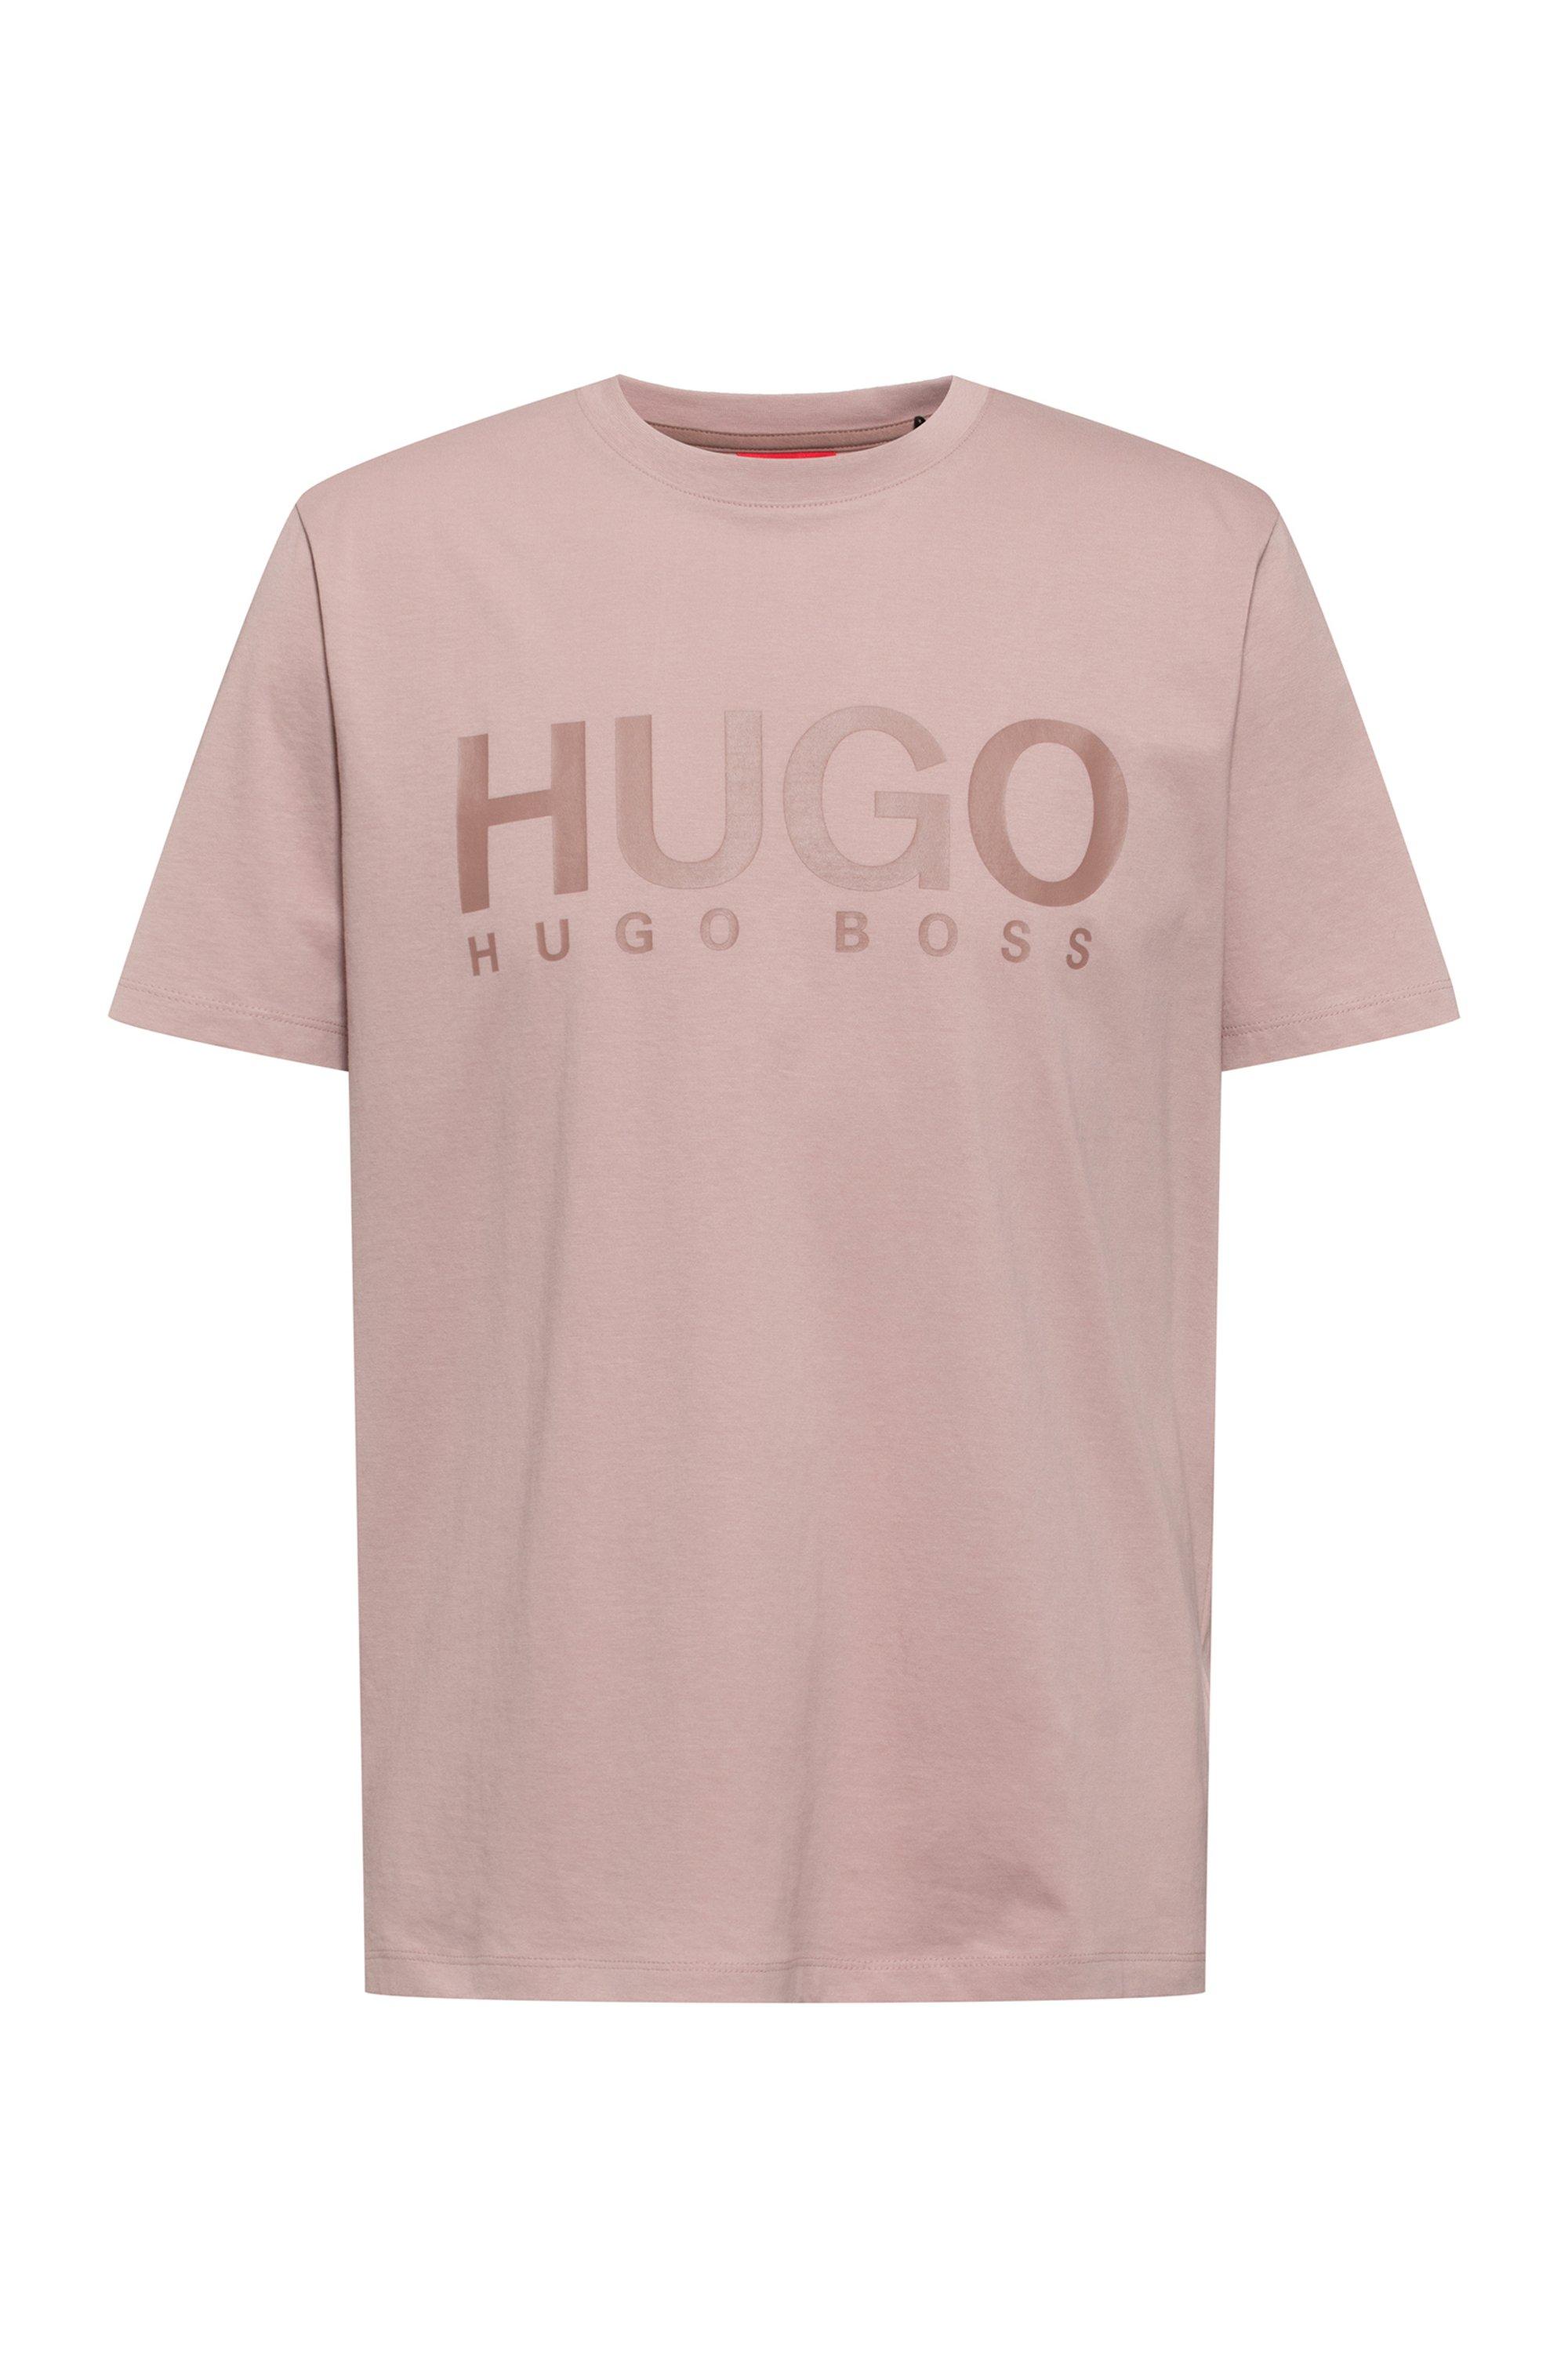 Logo-print crew-neck T-shirt in cotton jersey, Light Brown